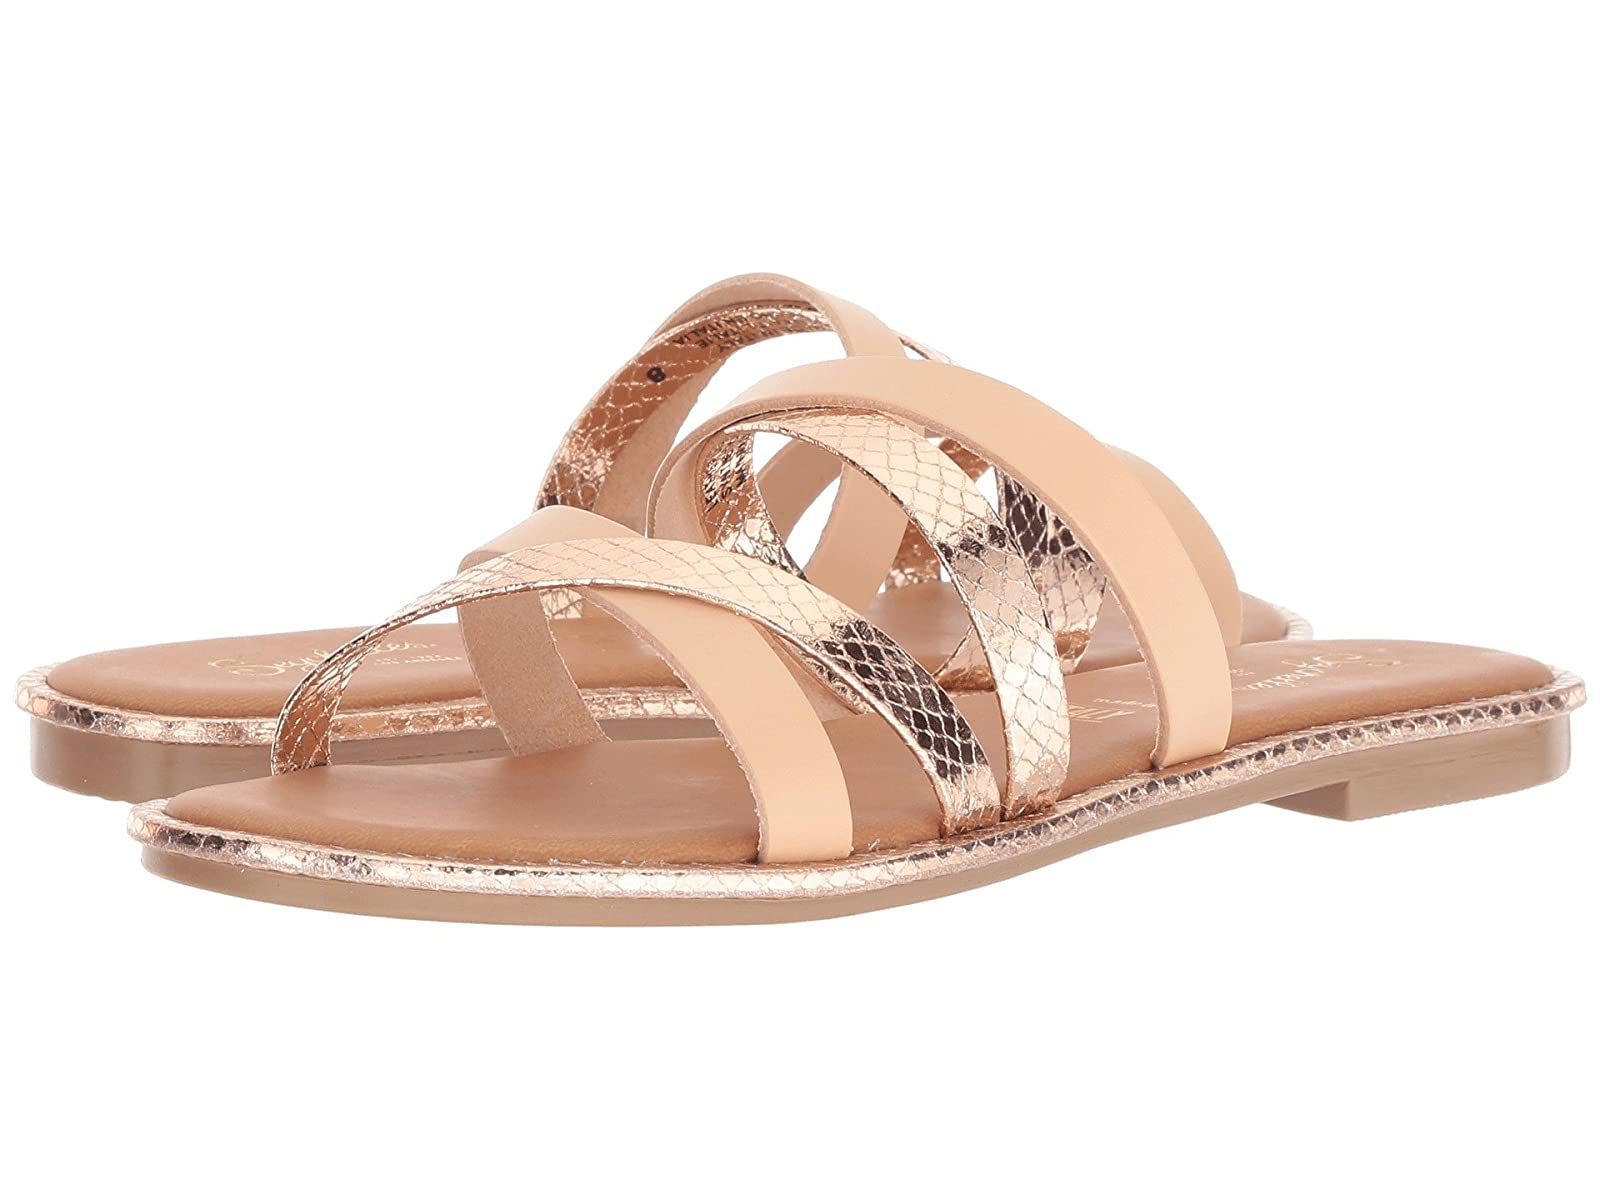 Seychelles PublicityAtmospheric grades have affordable shoes